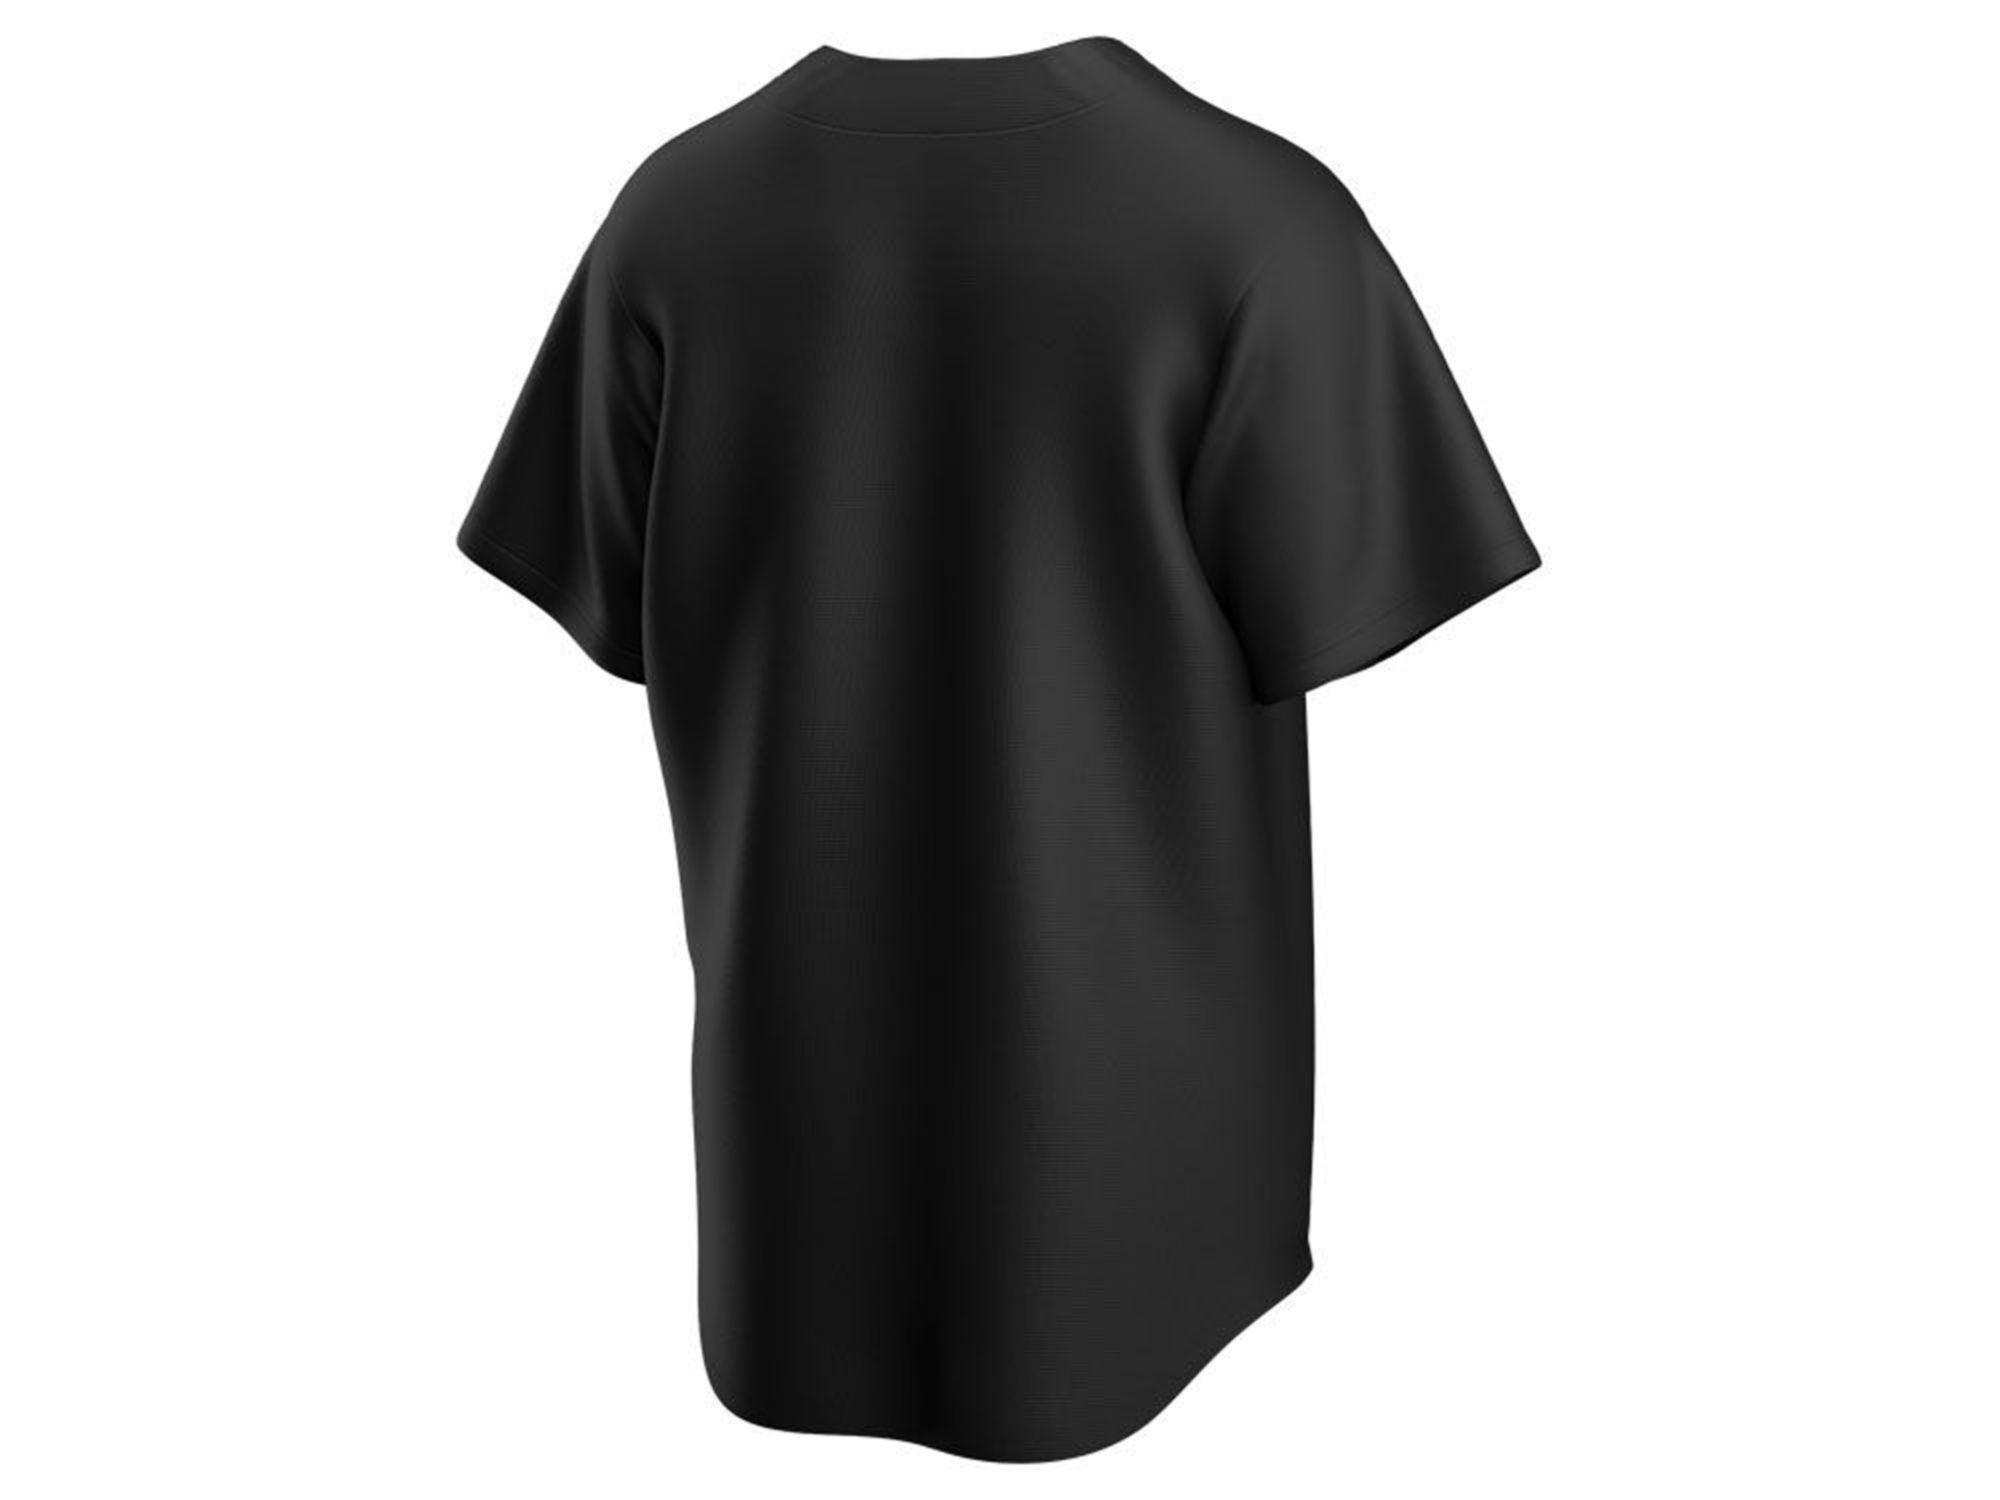 Nike New York Yankees MLB Men's Official Blank Replica Jersey & Reviews - Sports Fan Shop By Lids - Men - Macy's